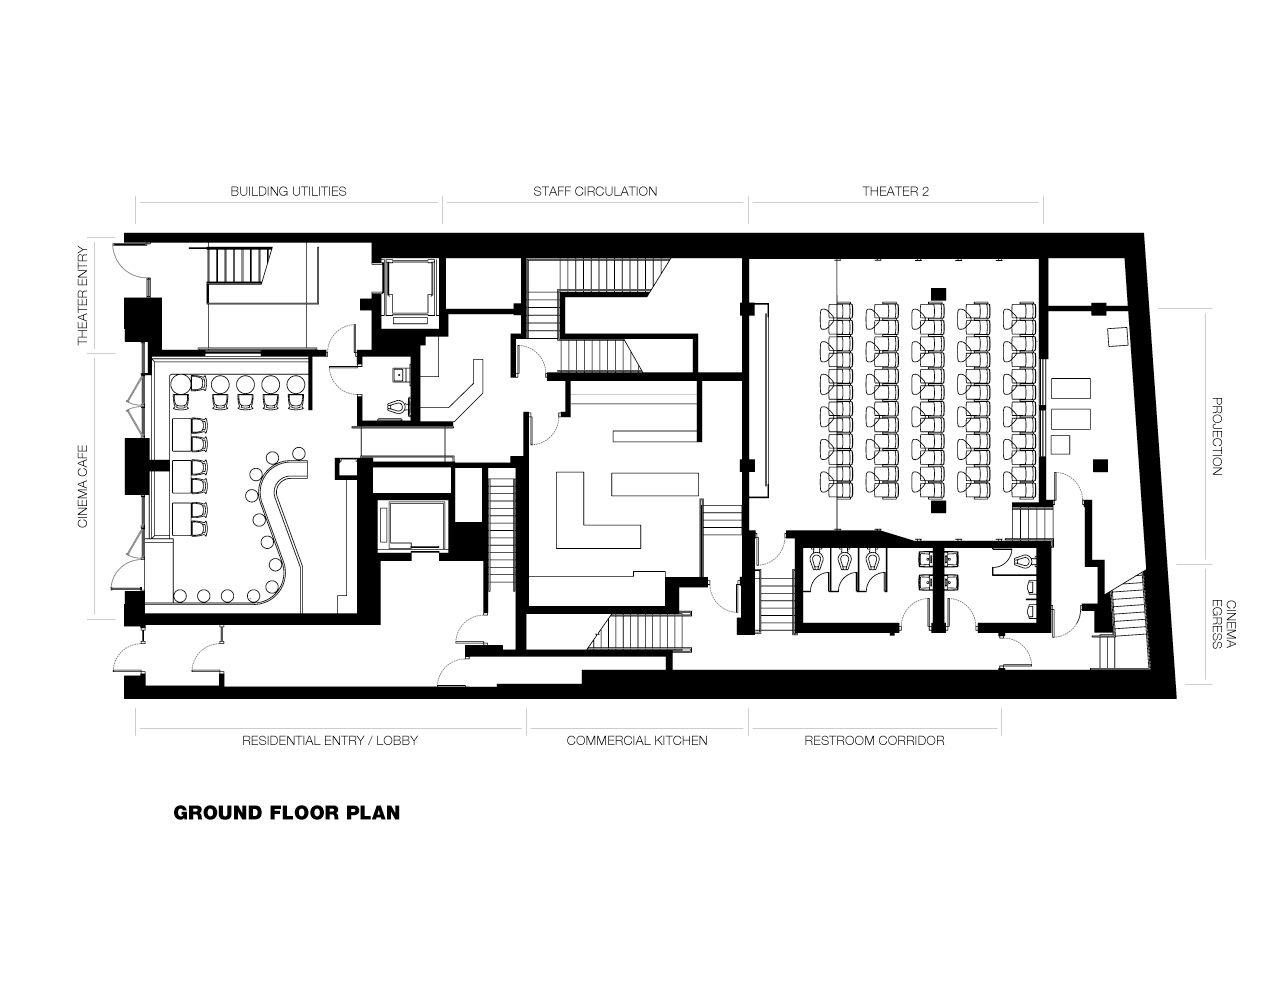 Gallery Of Nitehawk Cinema And Apartments Caliper Studio 3 How To Plan Floor Plans Ground Floor Plan